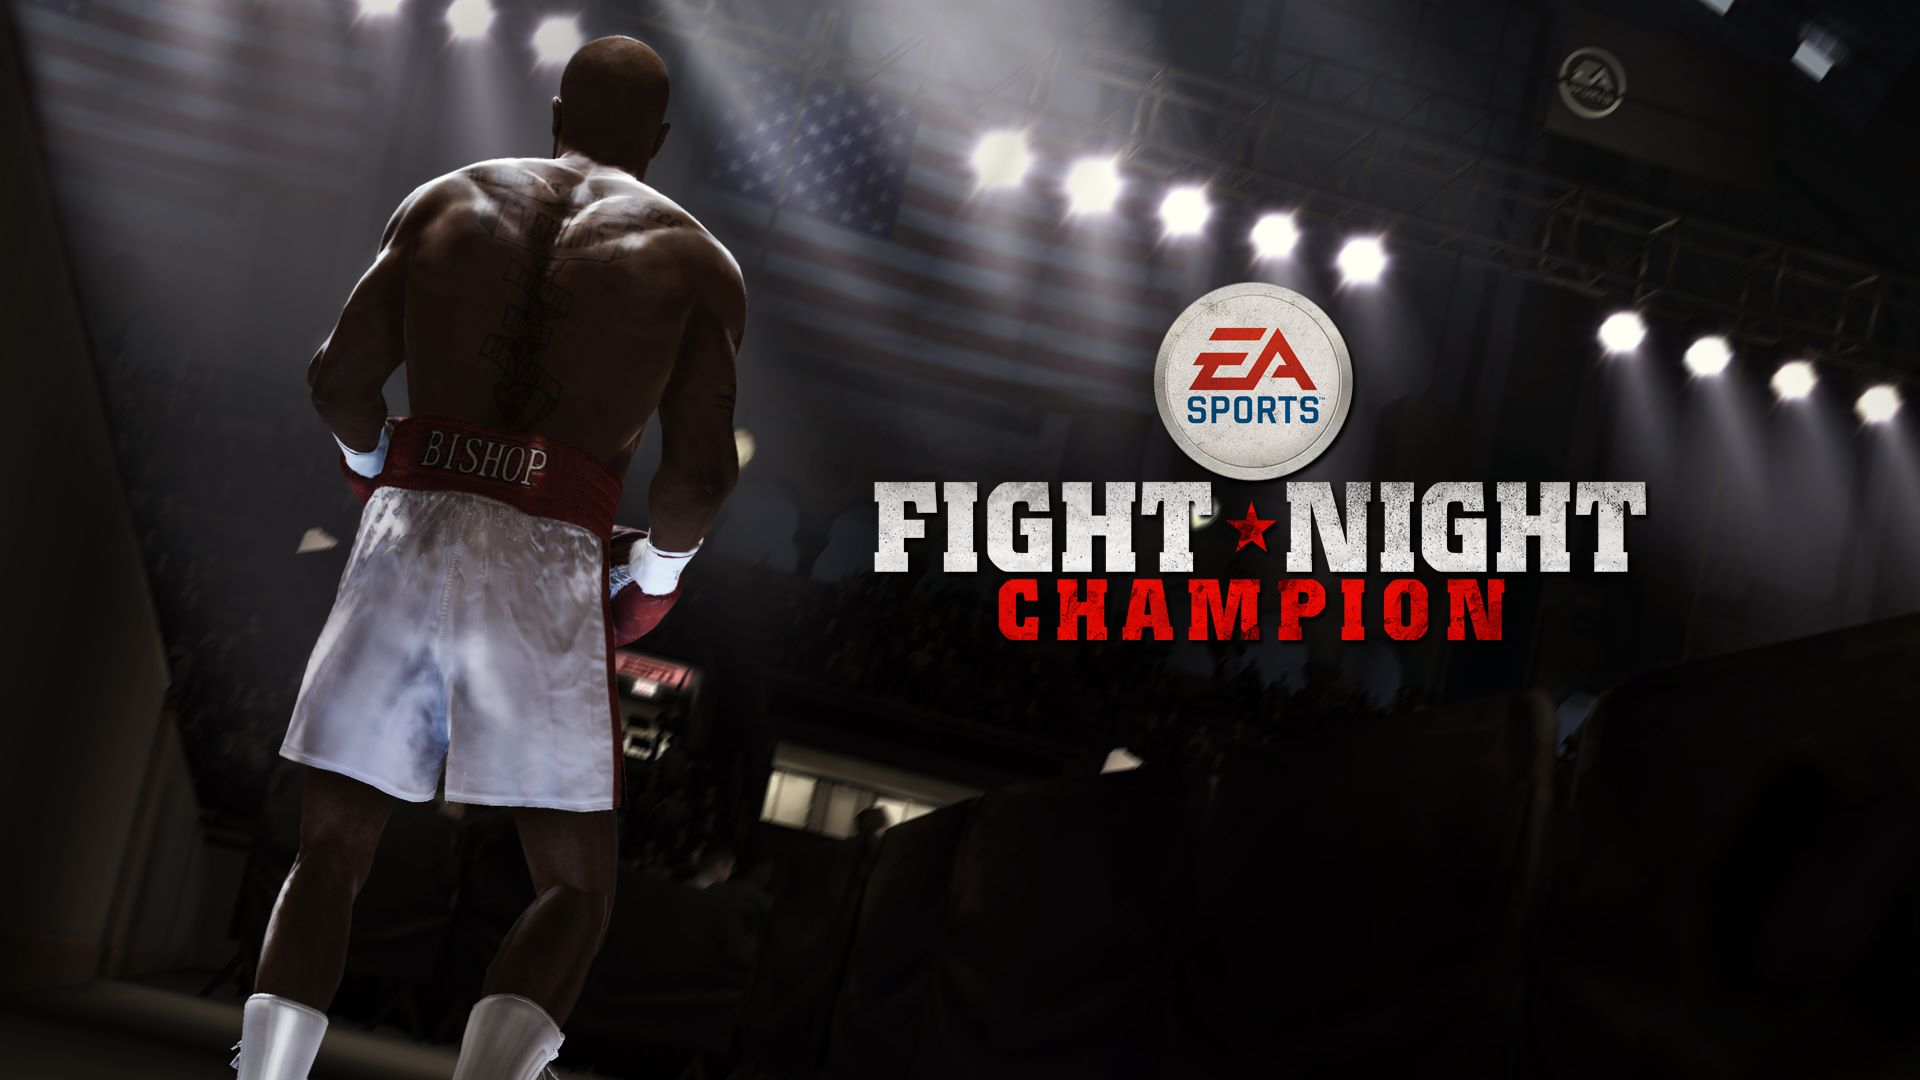 Fight Night Champion Xbox One X